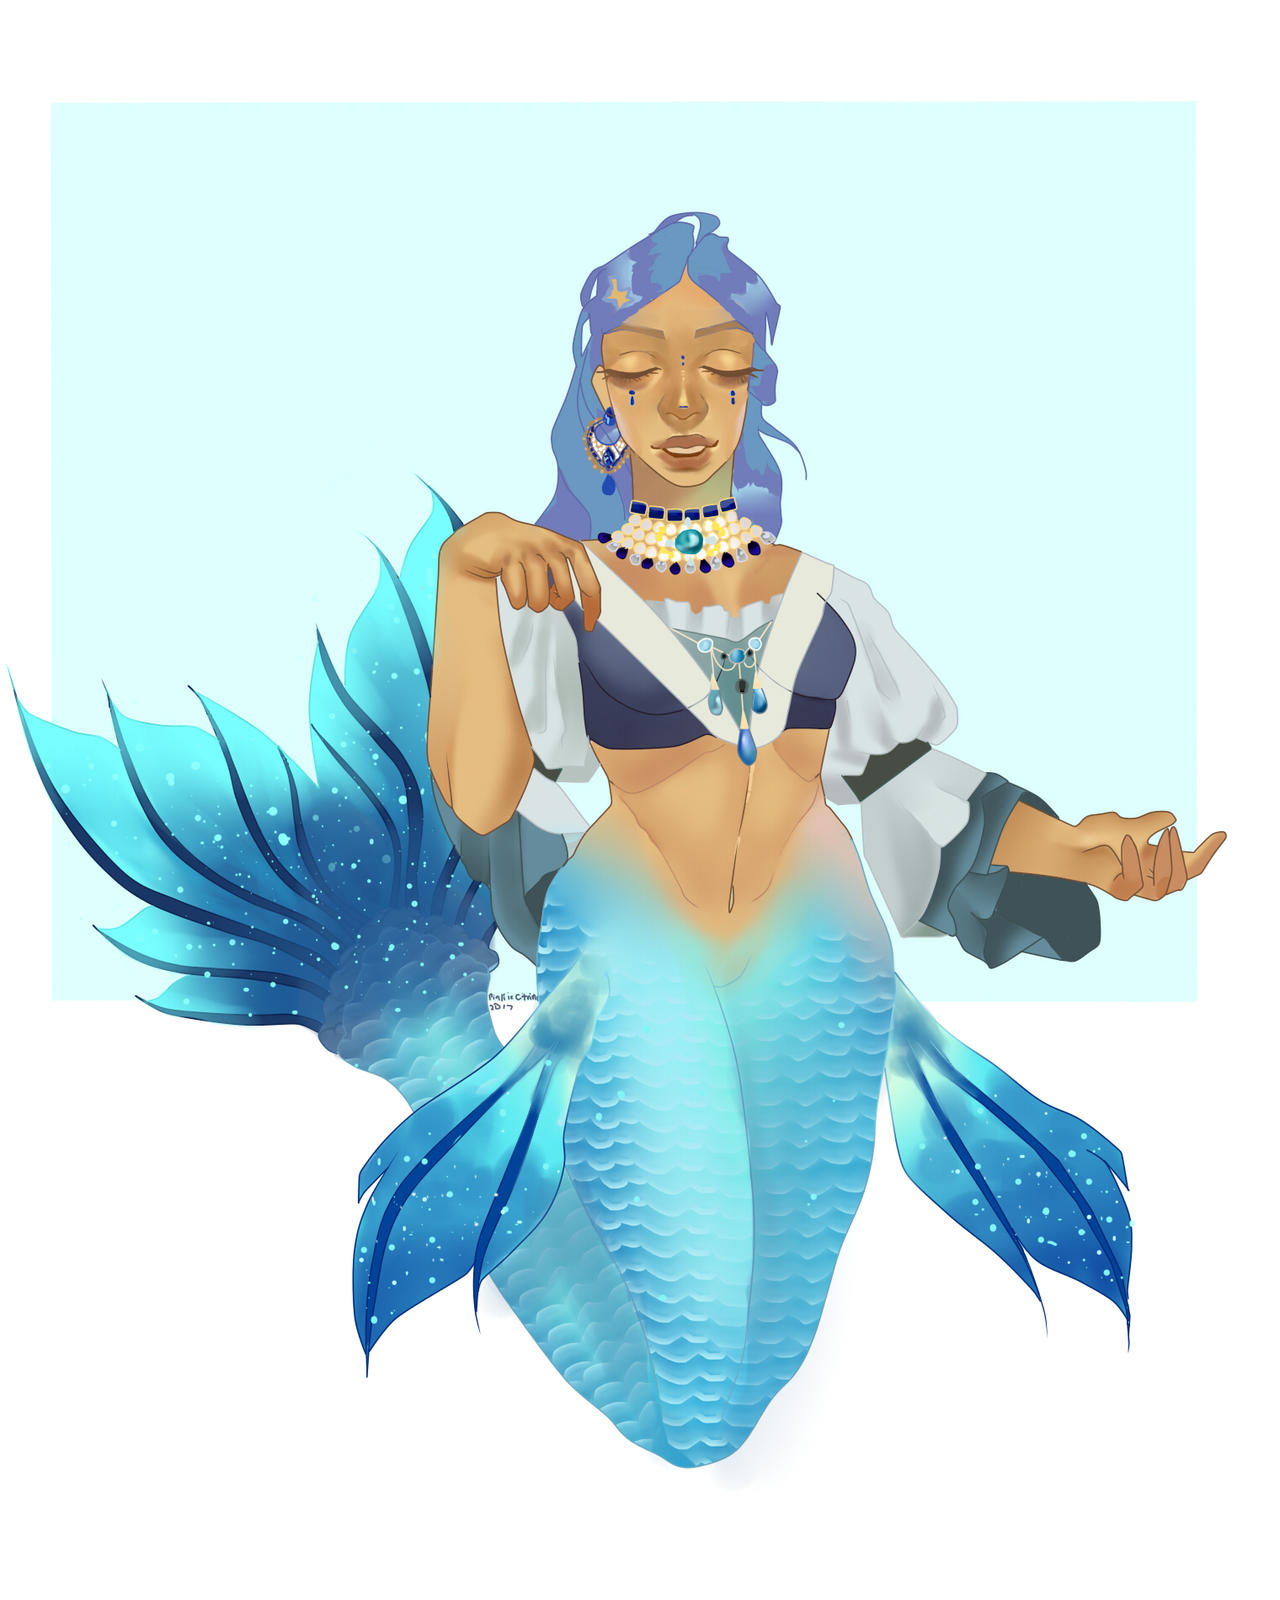 Hanon the Aqua Princess of the South Atlantic by pinkiecitrine